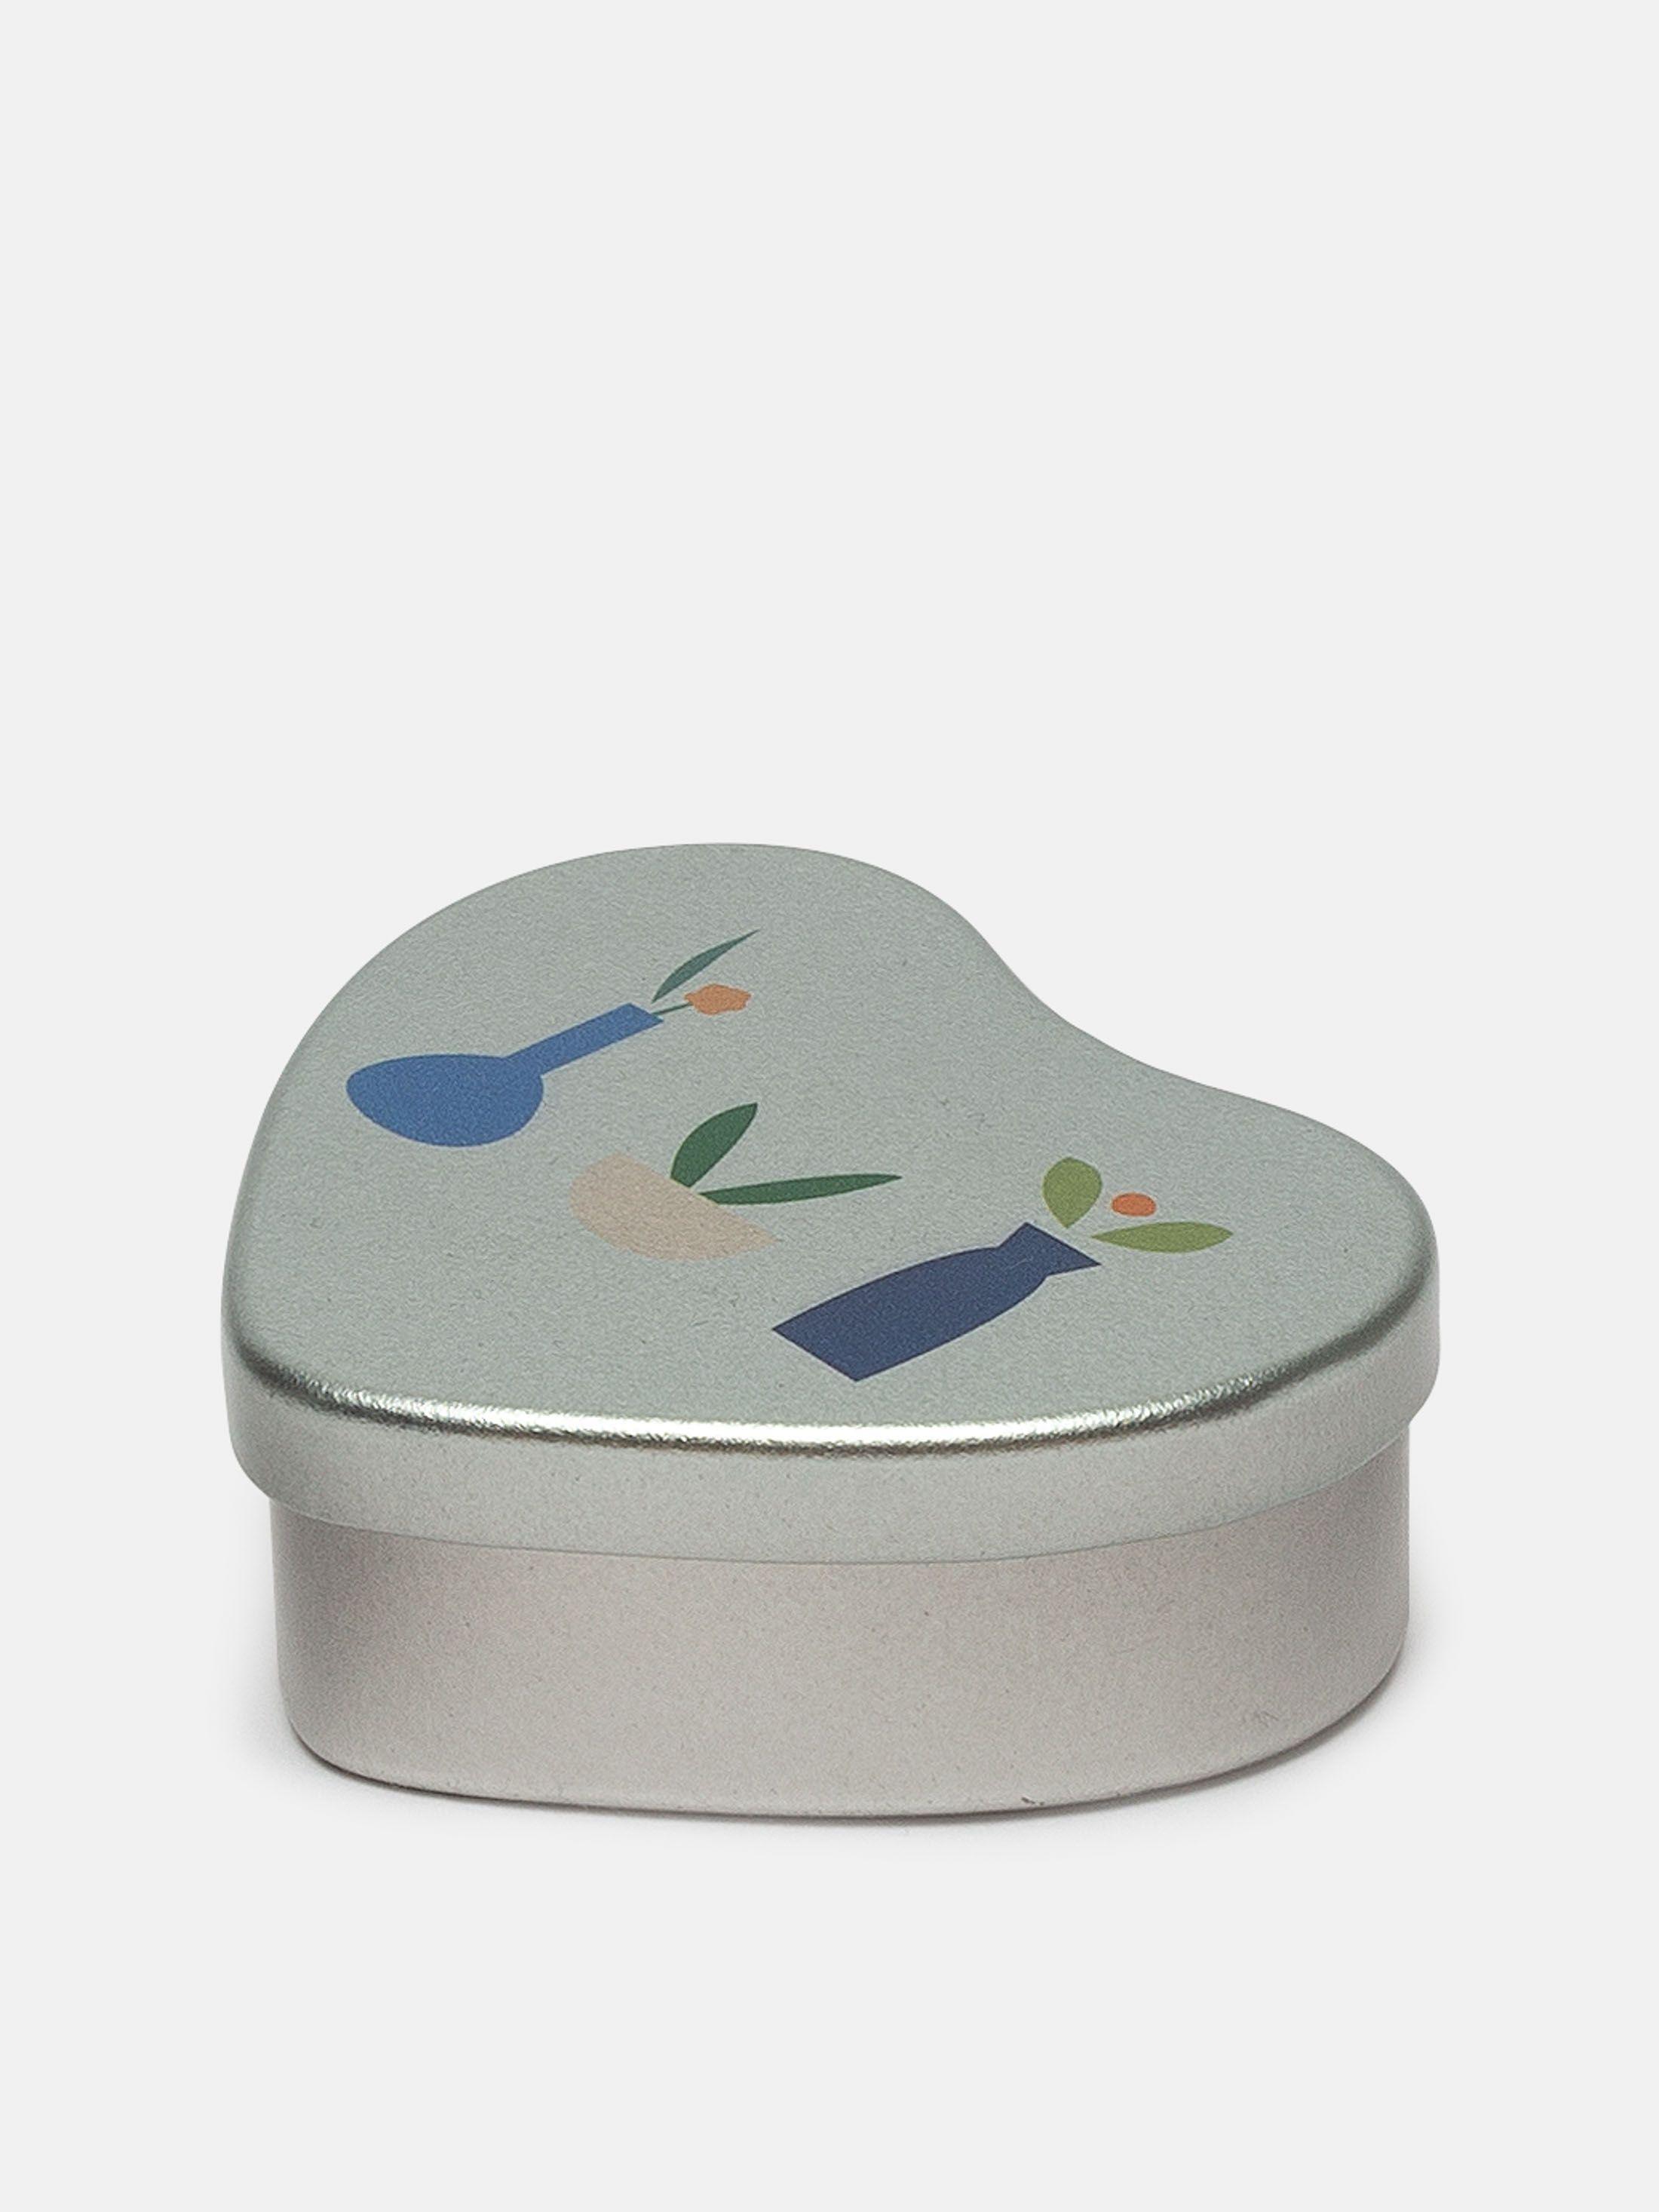 plain heart shaped tin details